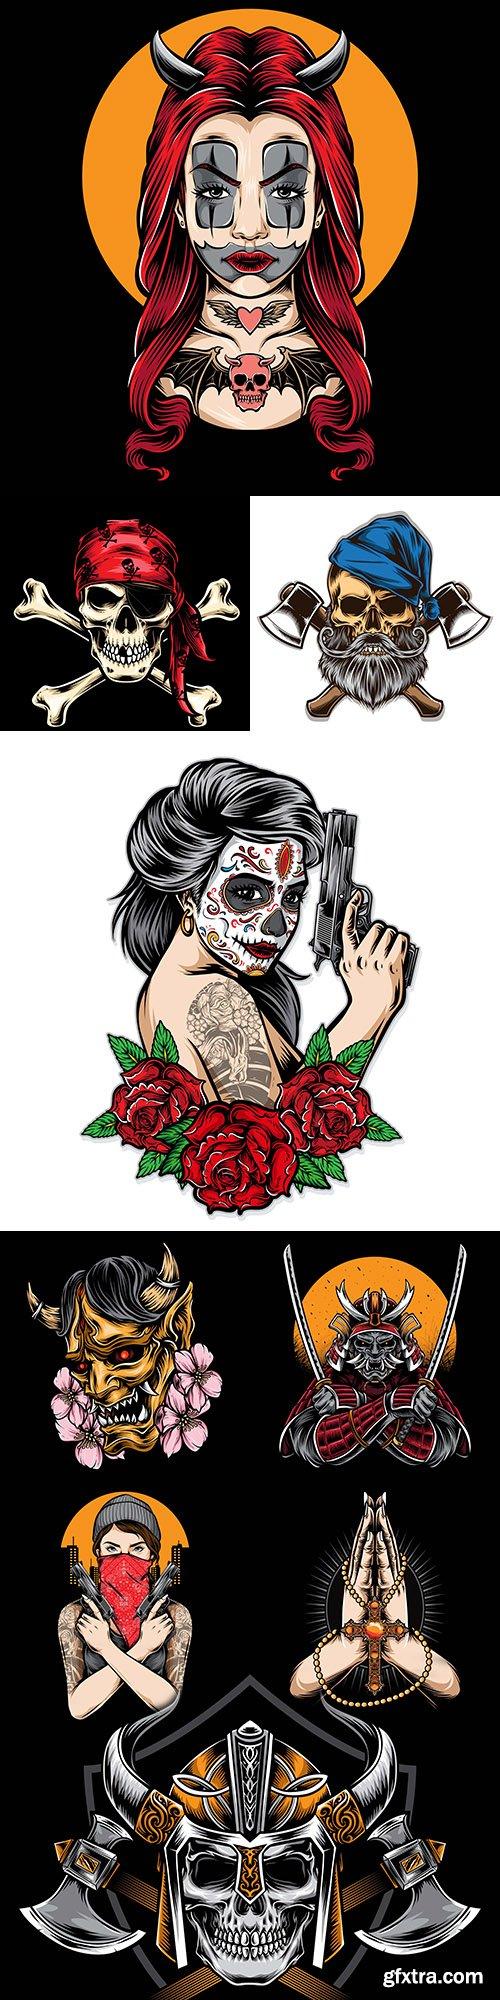 Tattoo and logo cartoon drawing design illustration 3